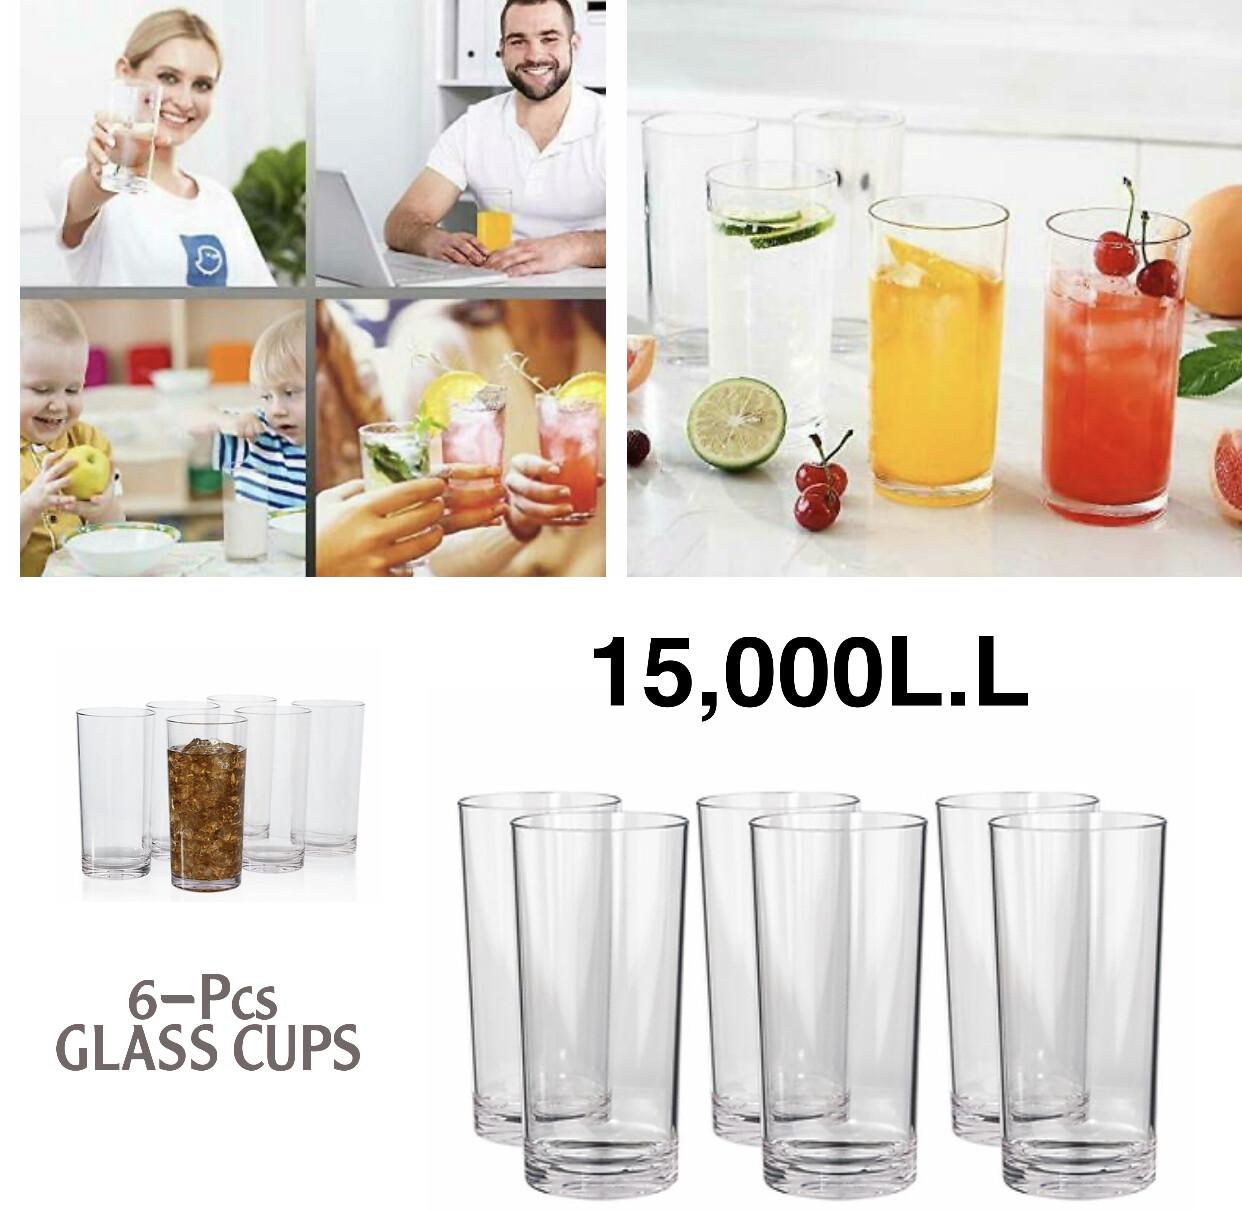 6-Pcs Clear Glass Cups